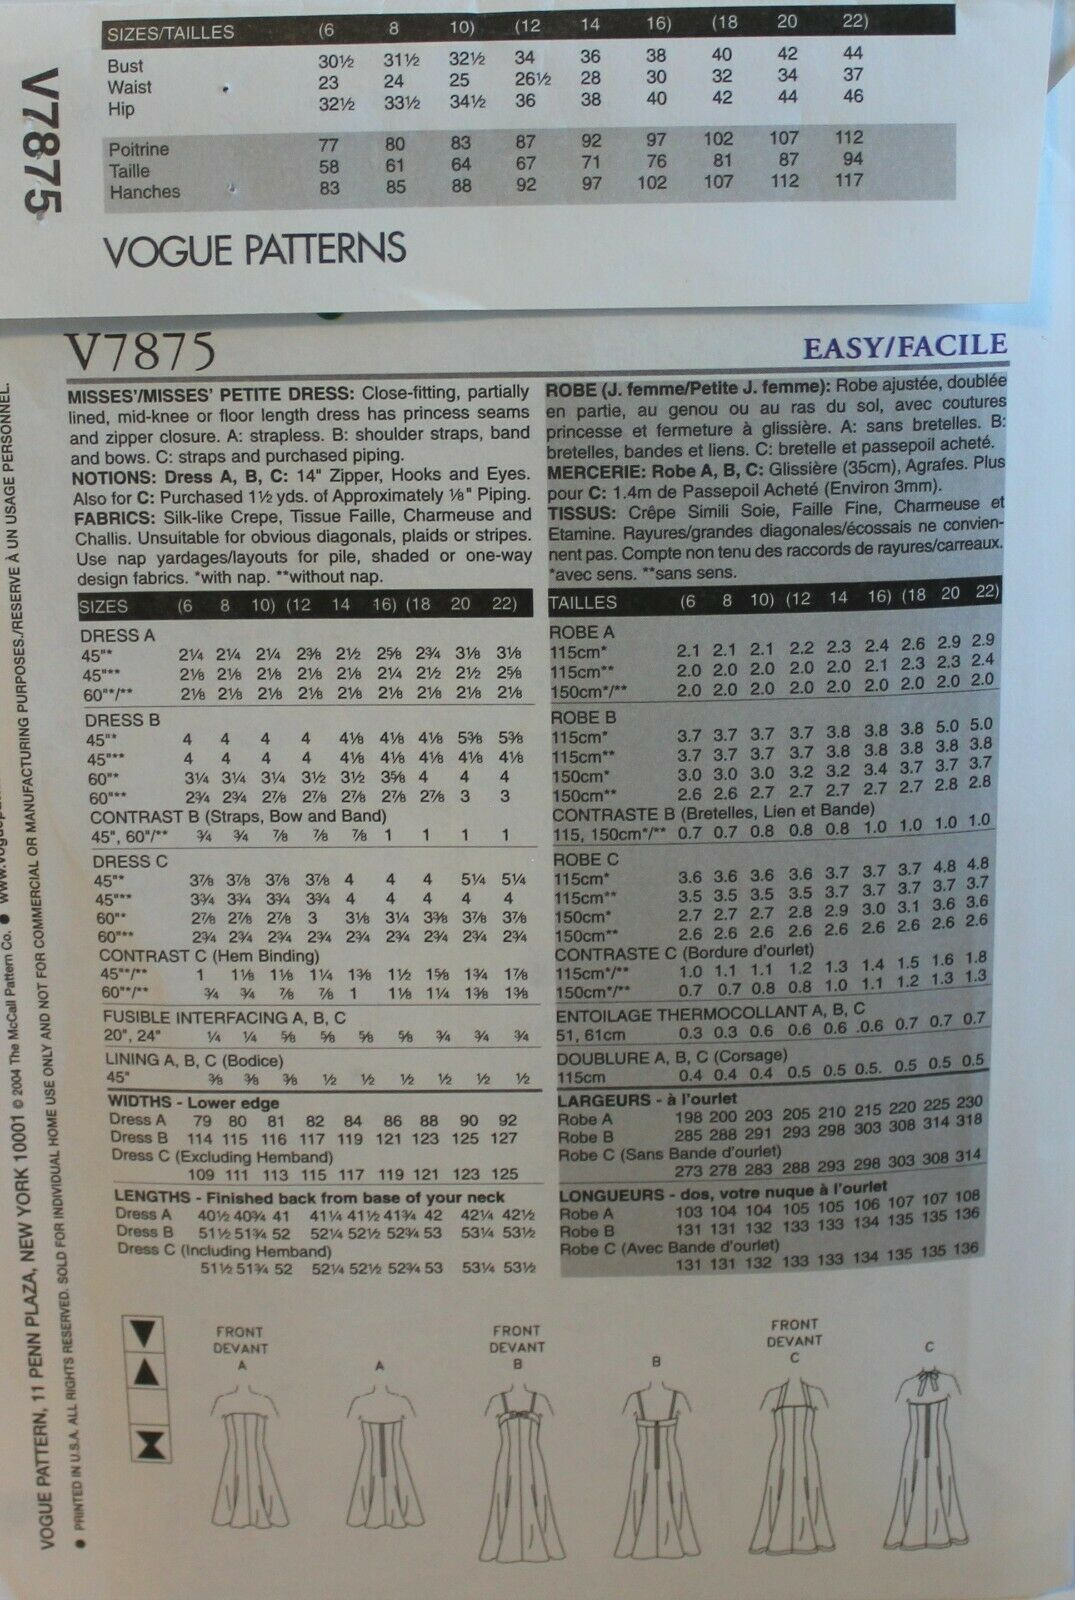 Vogue Sewing Pattern 7875 Misses Dress Halter Strapless Size 18 20 22 image 2